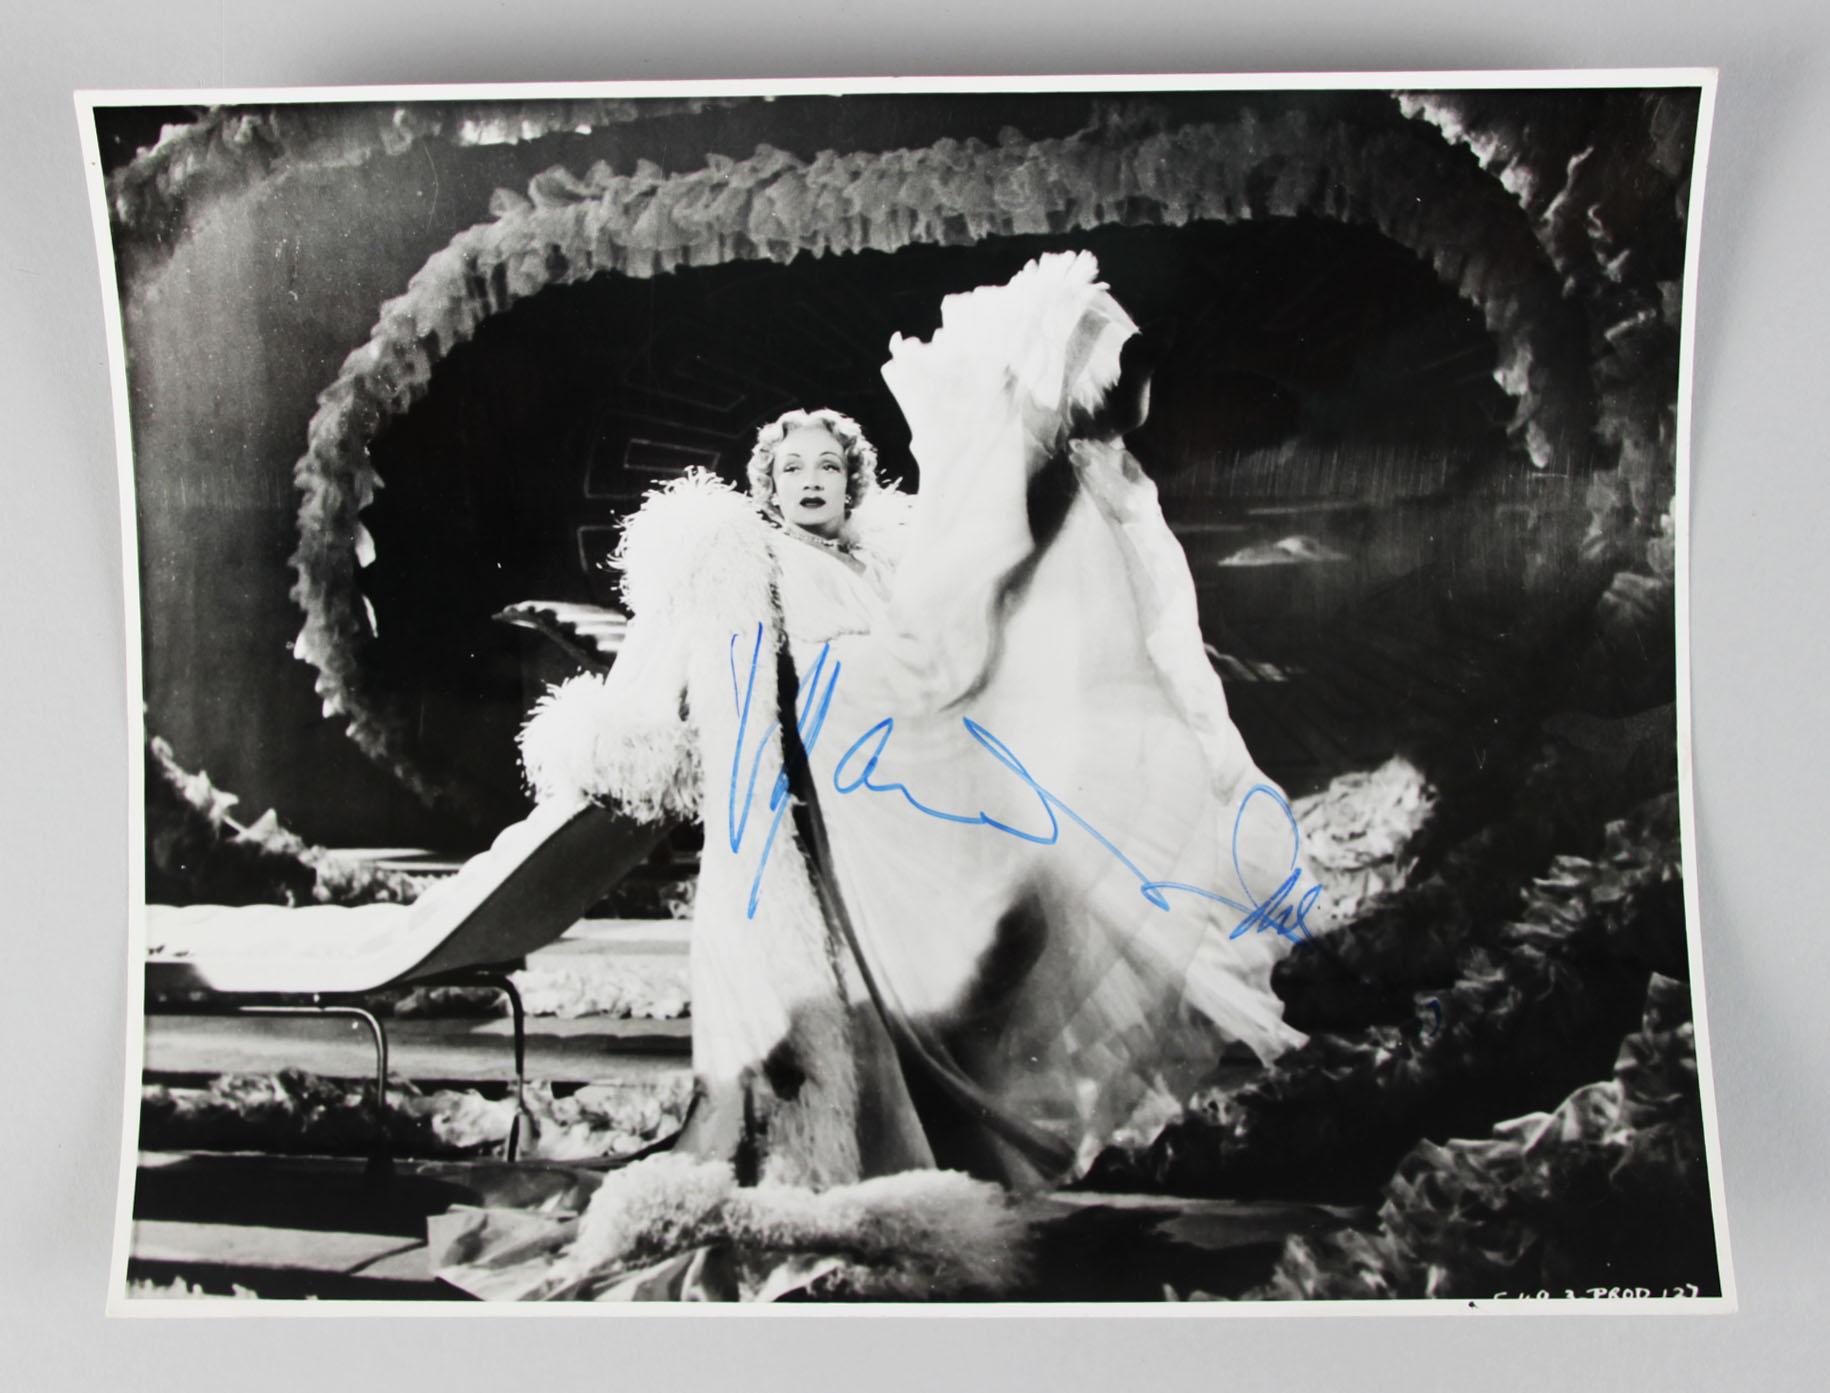 Stage Fright - Marlene Dietrich Signed (Full Signature) 8x10 Photo- COA JSA